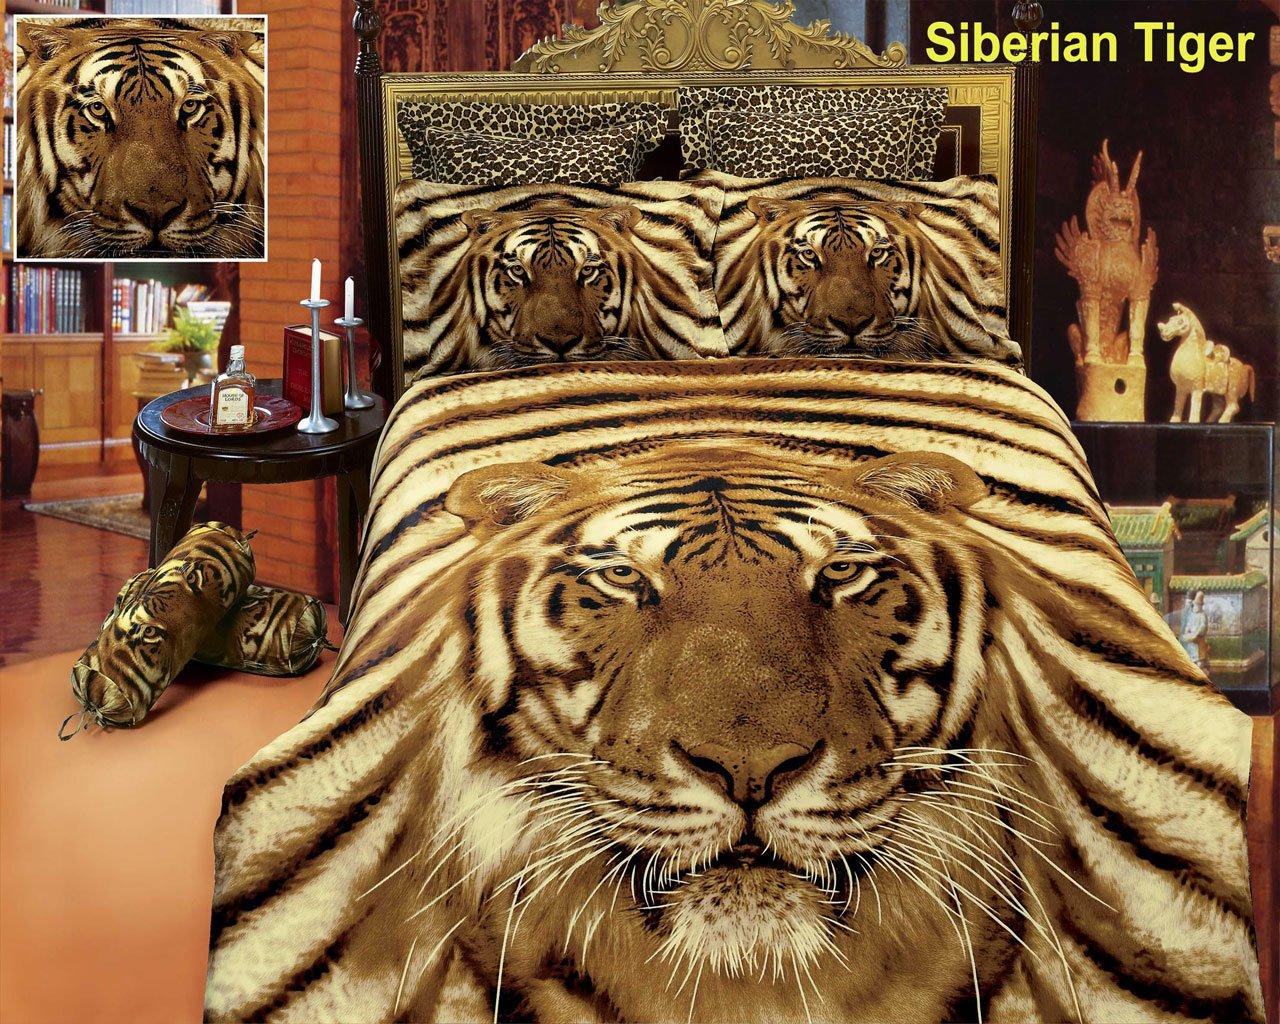 Siberian Tiger By Dolce Mela 6 Pc Duvet Cover Set Bed In